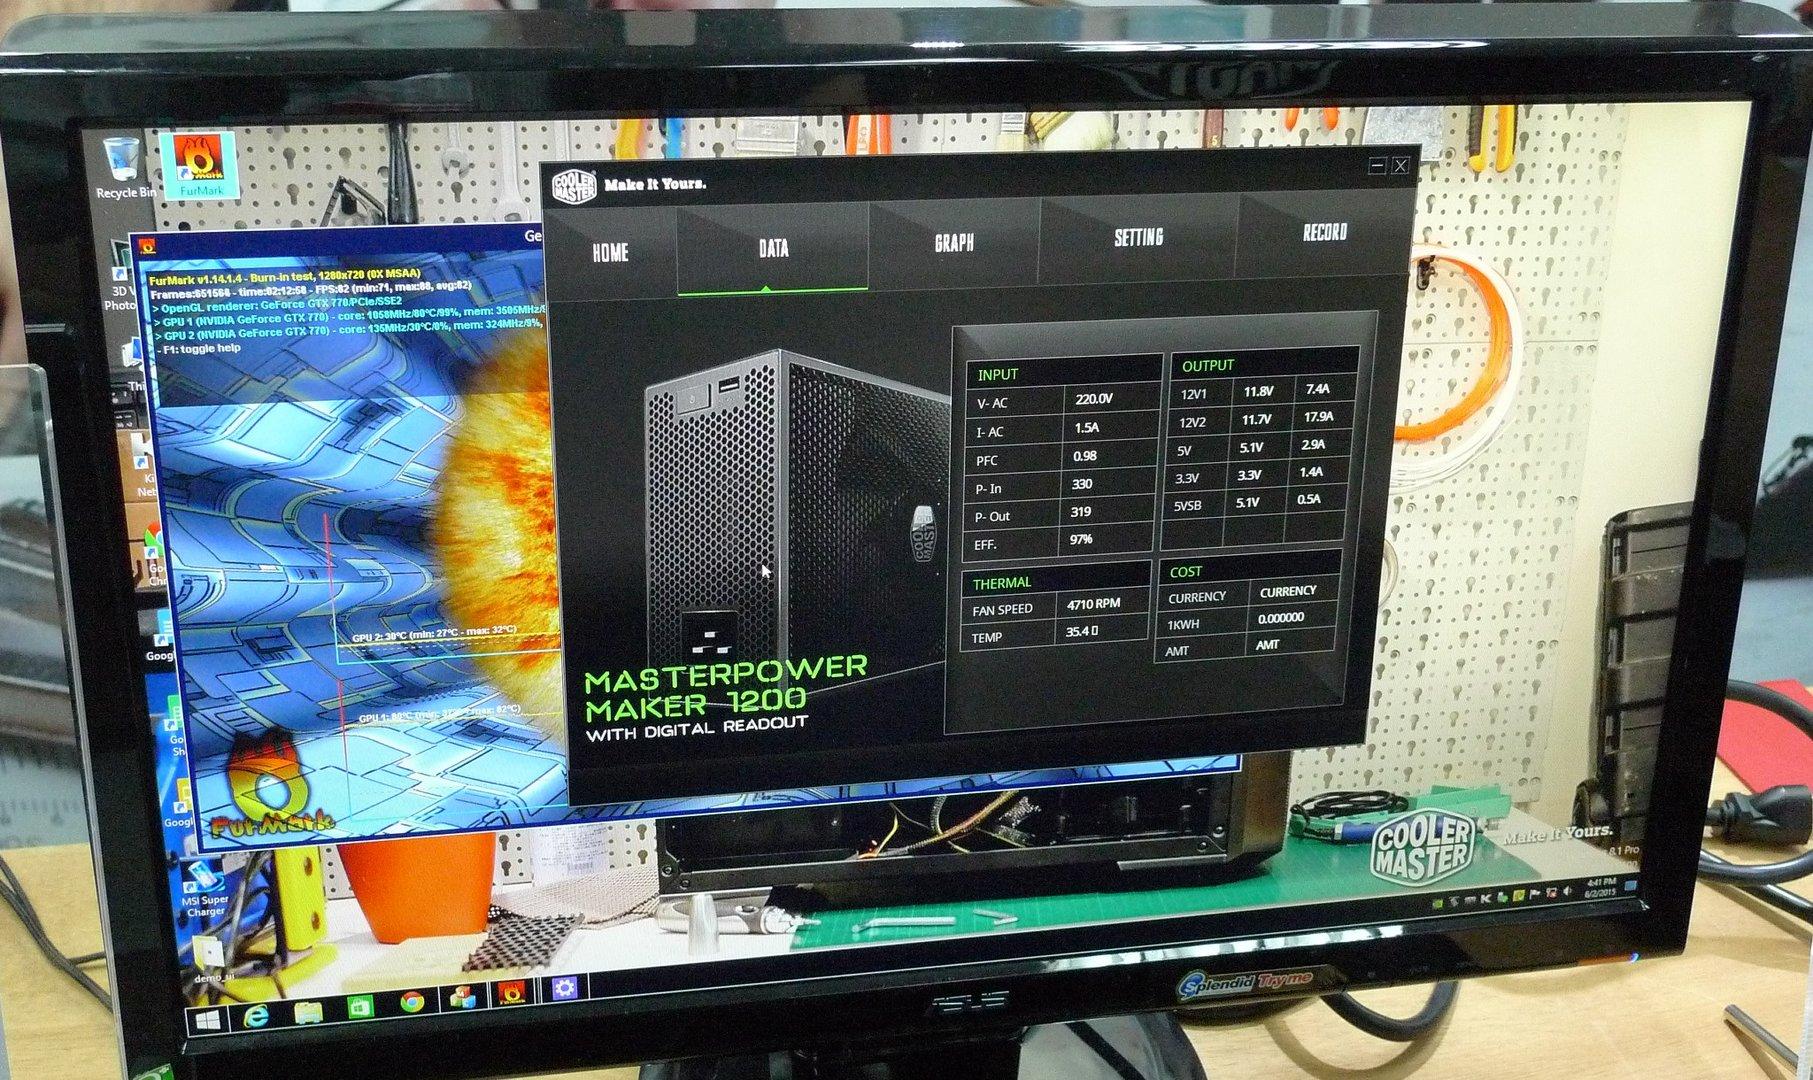 Cooler Master Masterpower Maker – Software